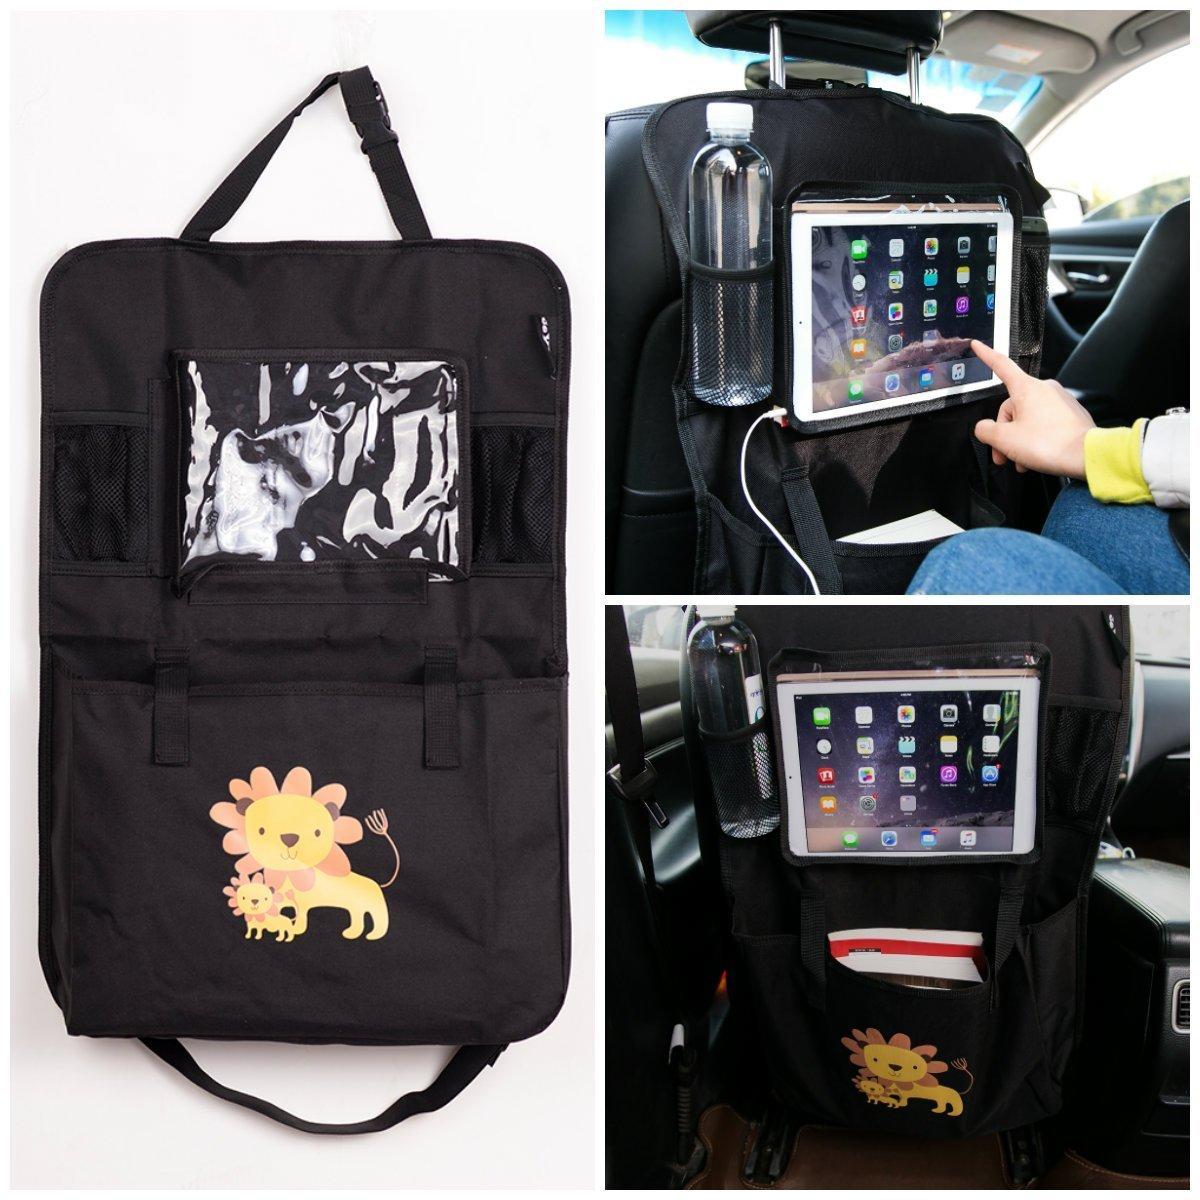 Car Back Seat Organiser With Max 9.7 inch iPad / Tablet Holder Multi-Pocket Storage Kick Mat Organiser Protectors For Car, SUV, Baby Stroller Eyoo